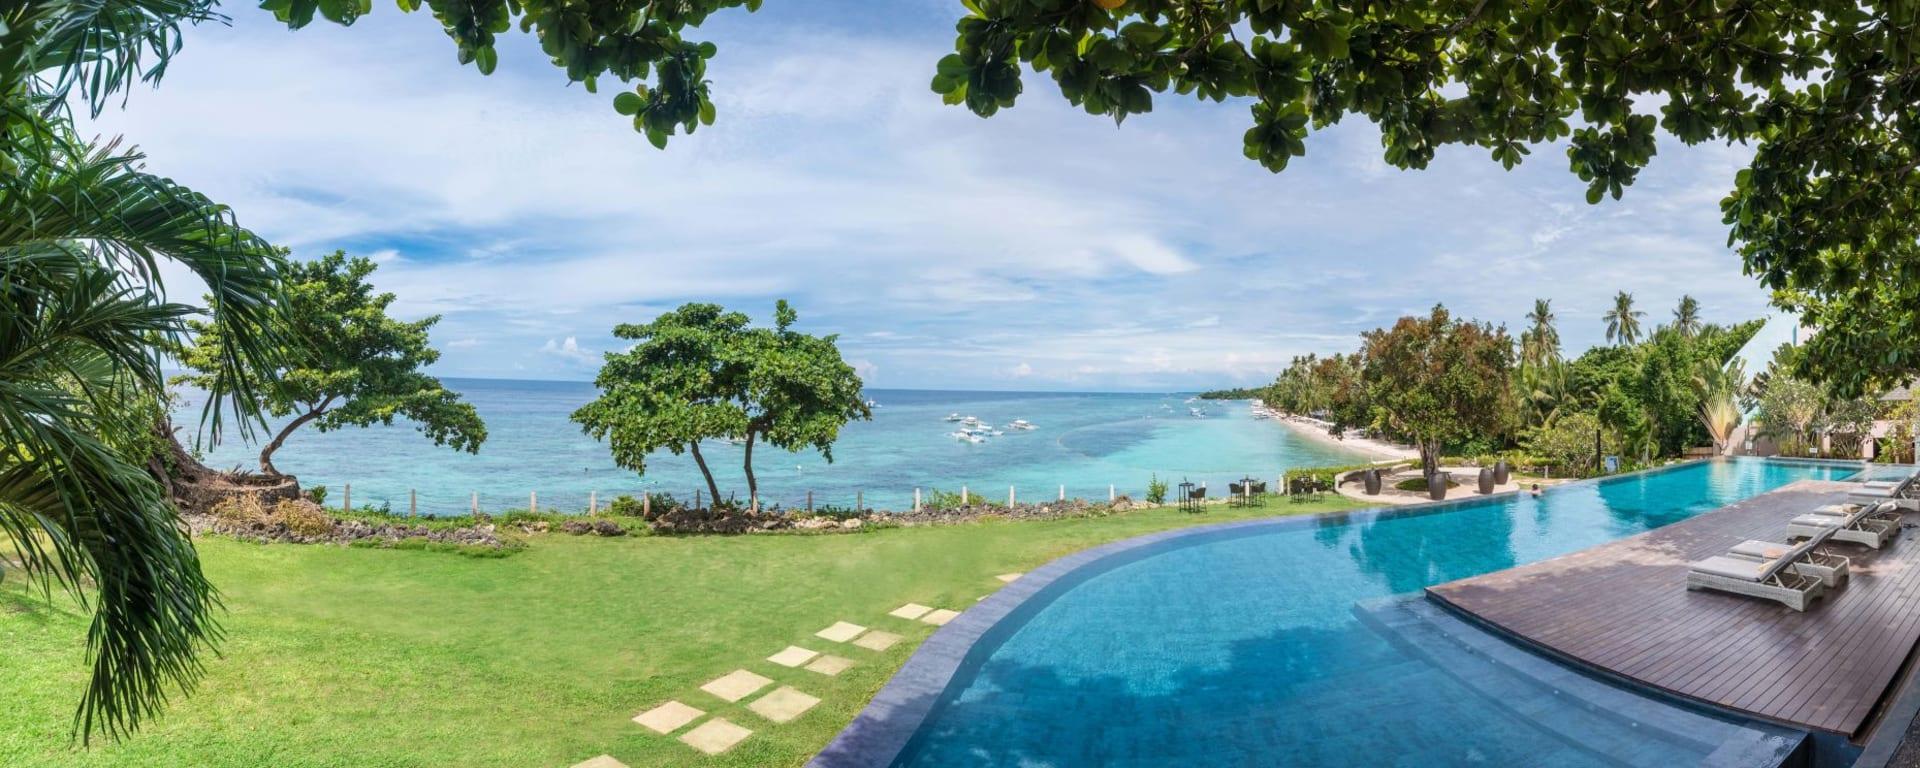 Amorita Resort in Bohol: Overlooking Alona Beach